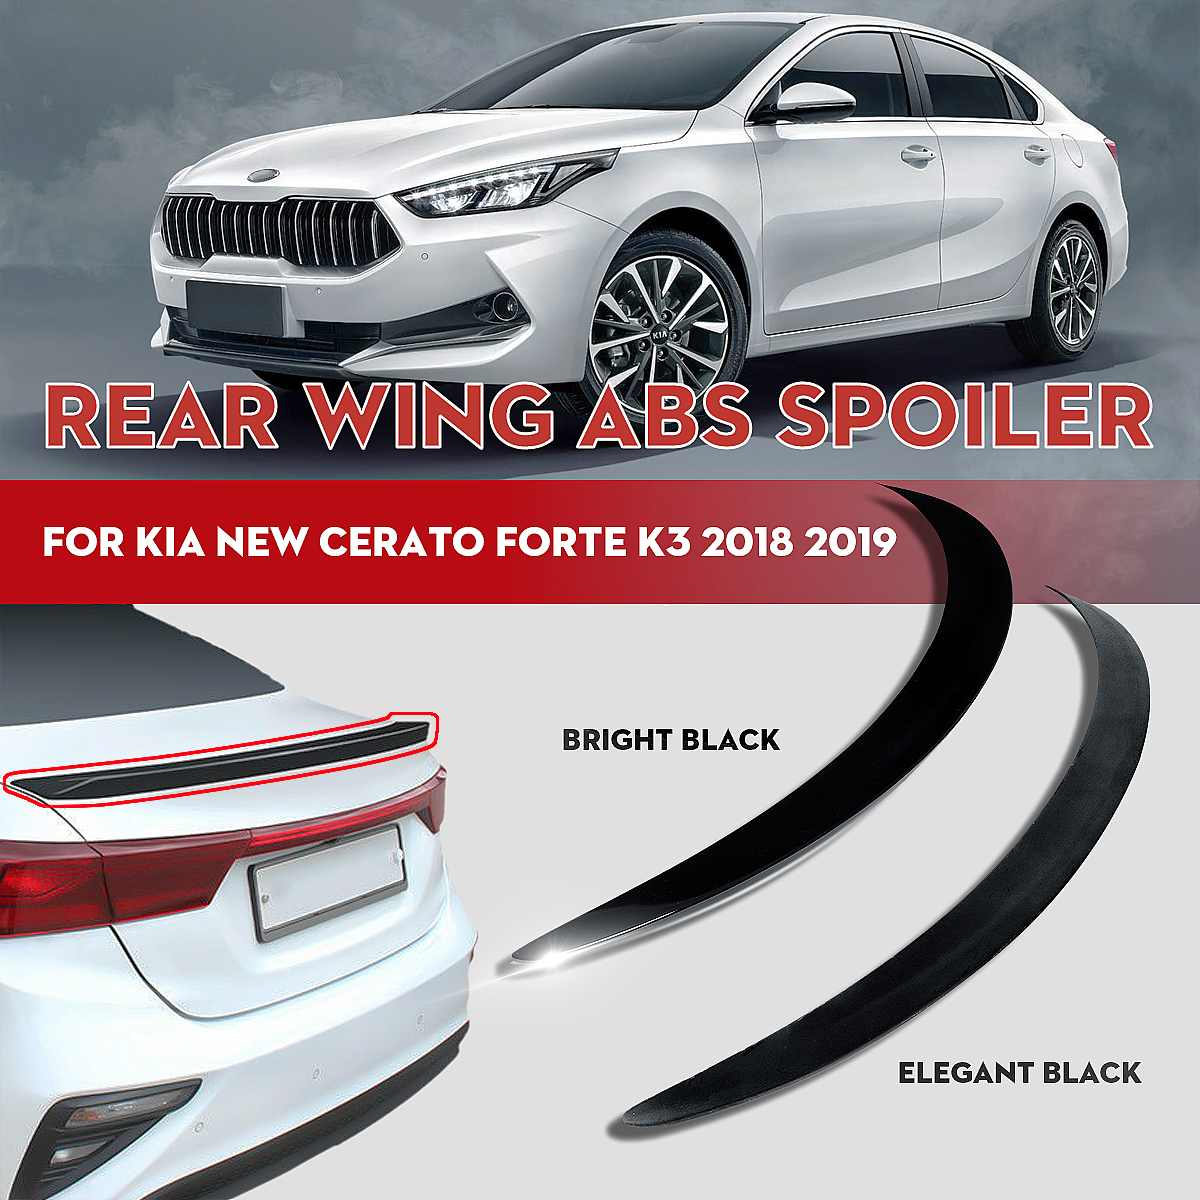 ABS ด้านหลังสปอยเลอร์ปีก GUARD Matte Bright สีดำสำหรับ Kia Cerato Forte กีฬา GT 2018 2019